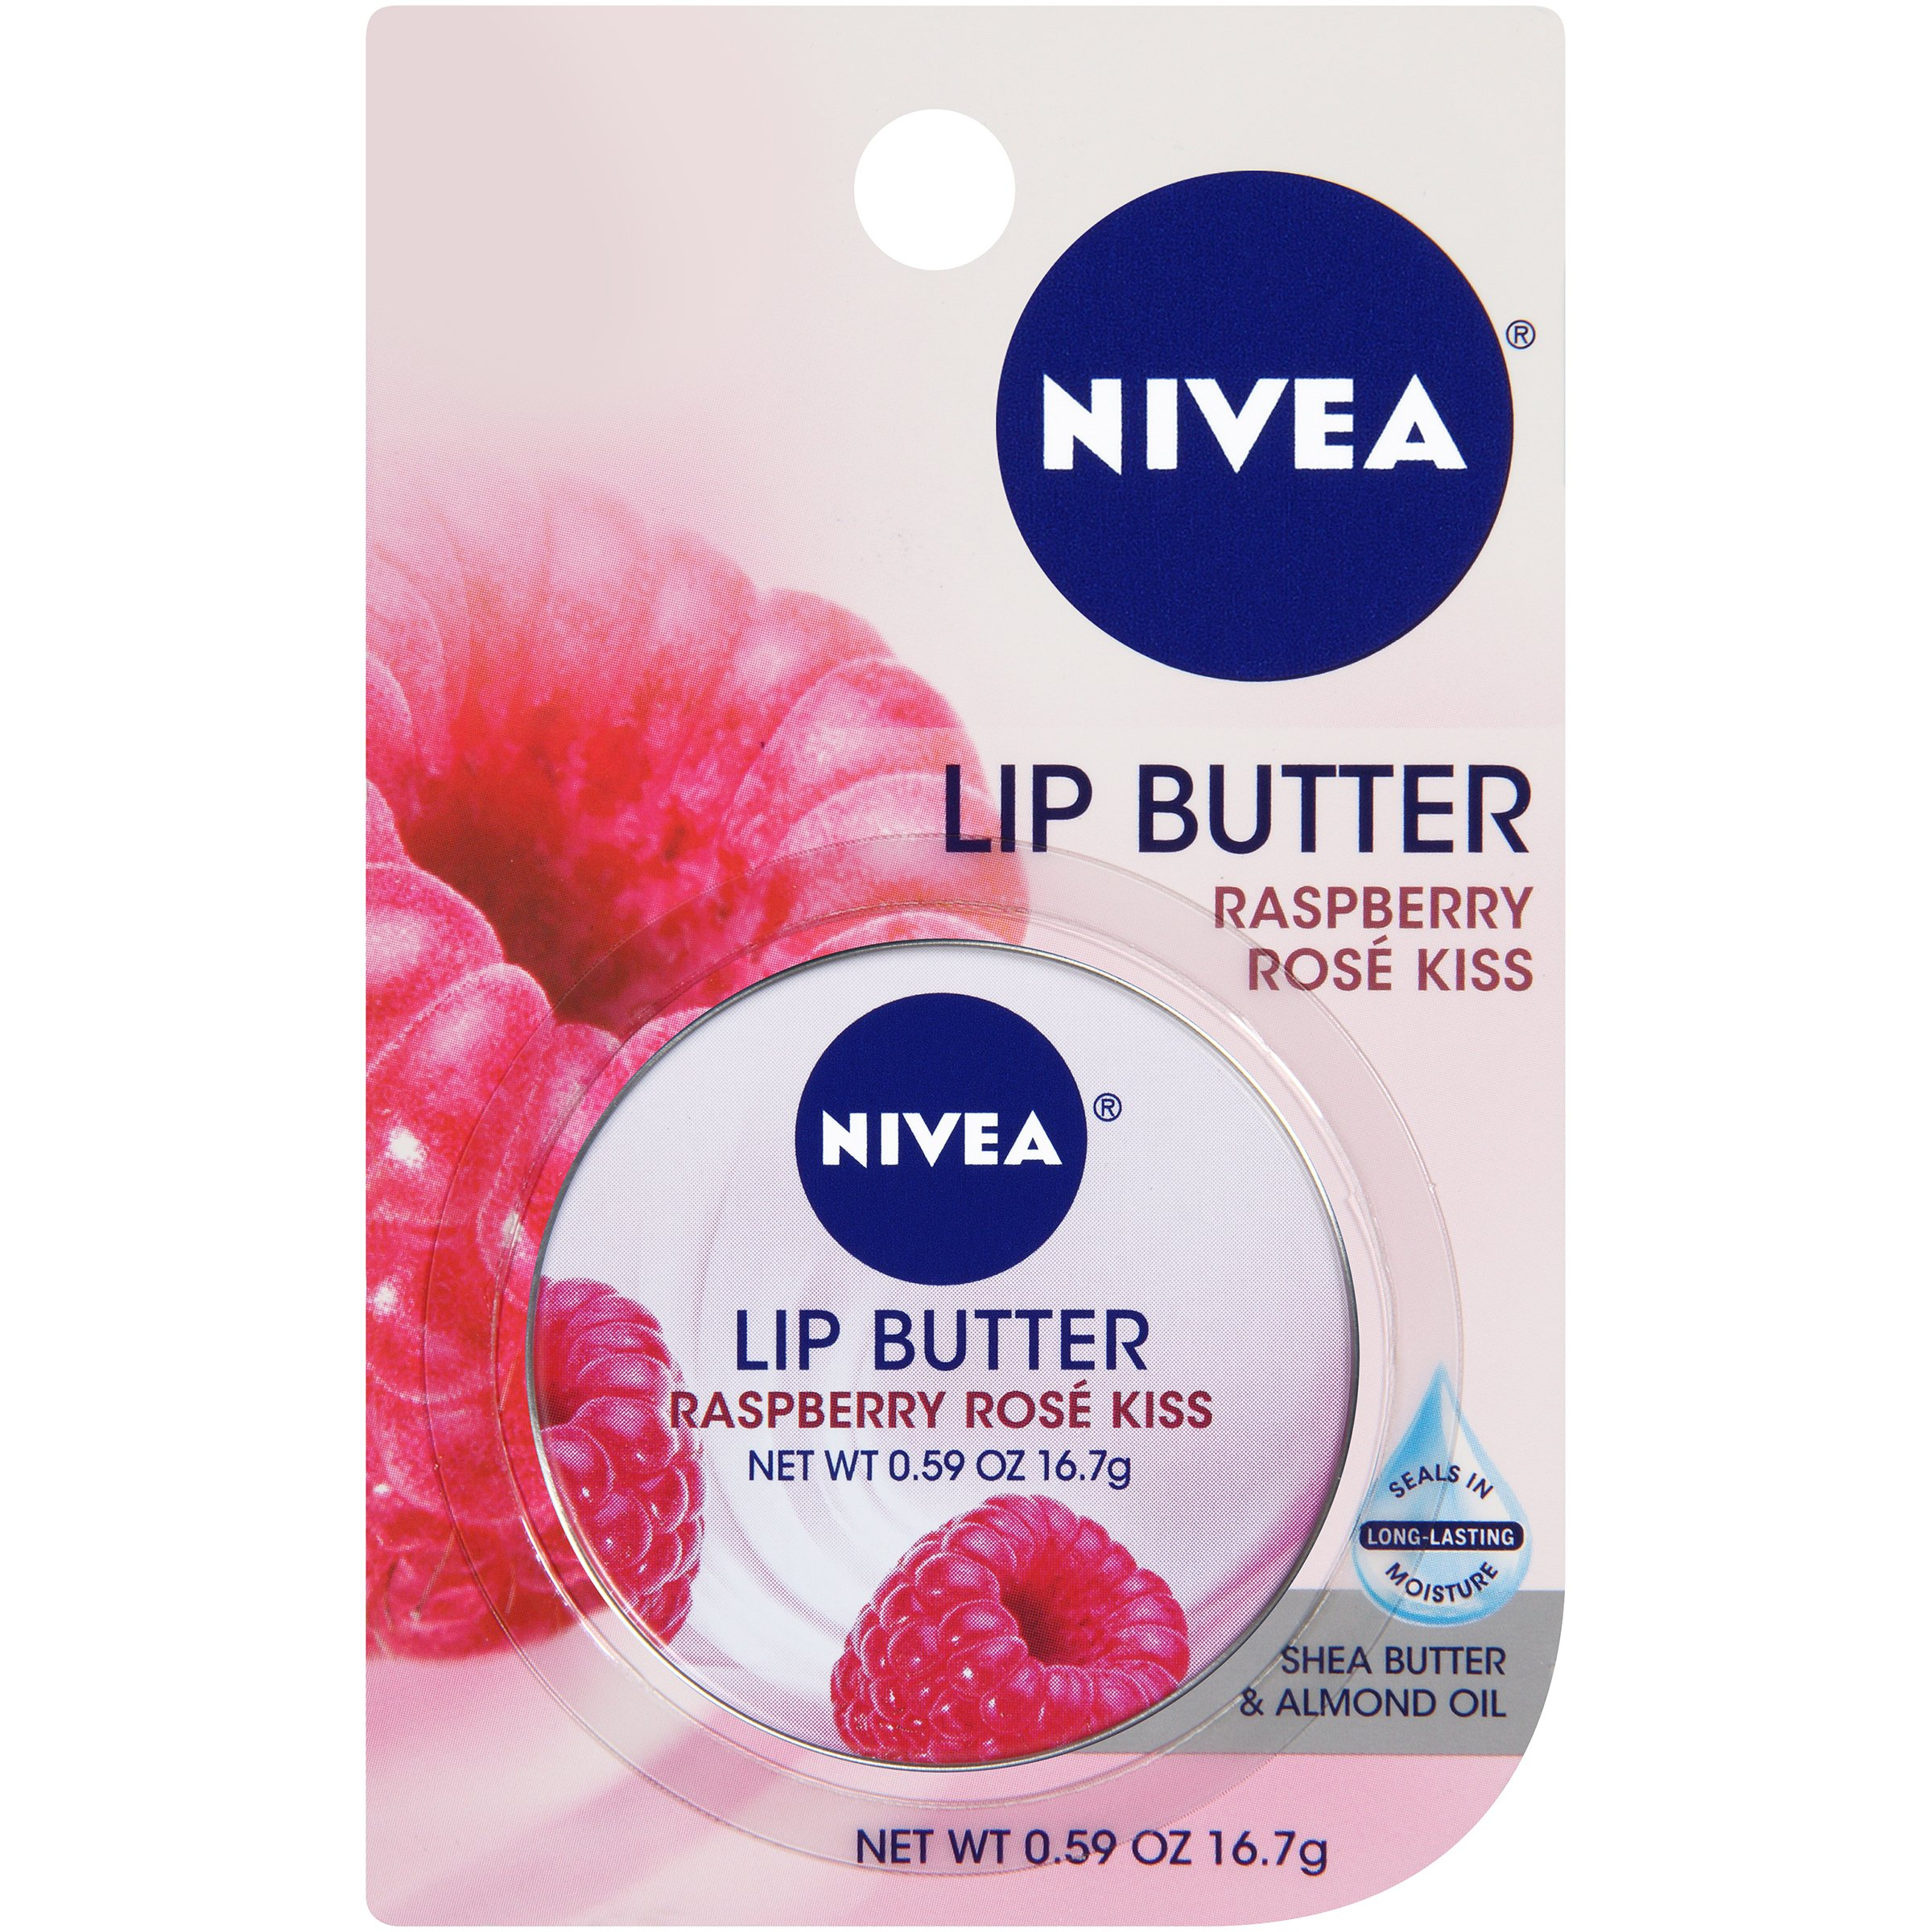 NIVEA Lip Butter Kiss Tin, Raspberry Rose 0.59 oz (Pack of 7)